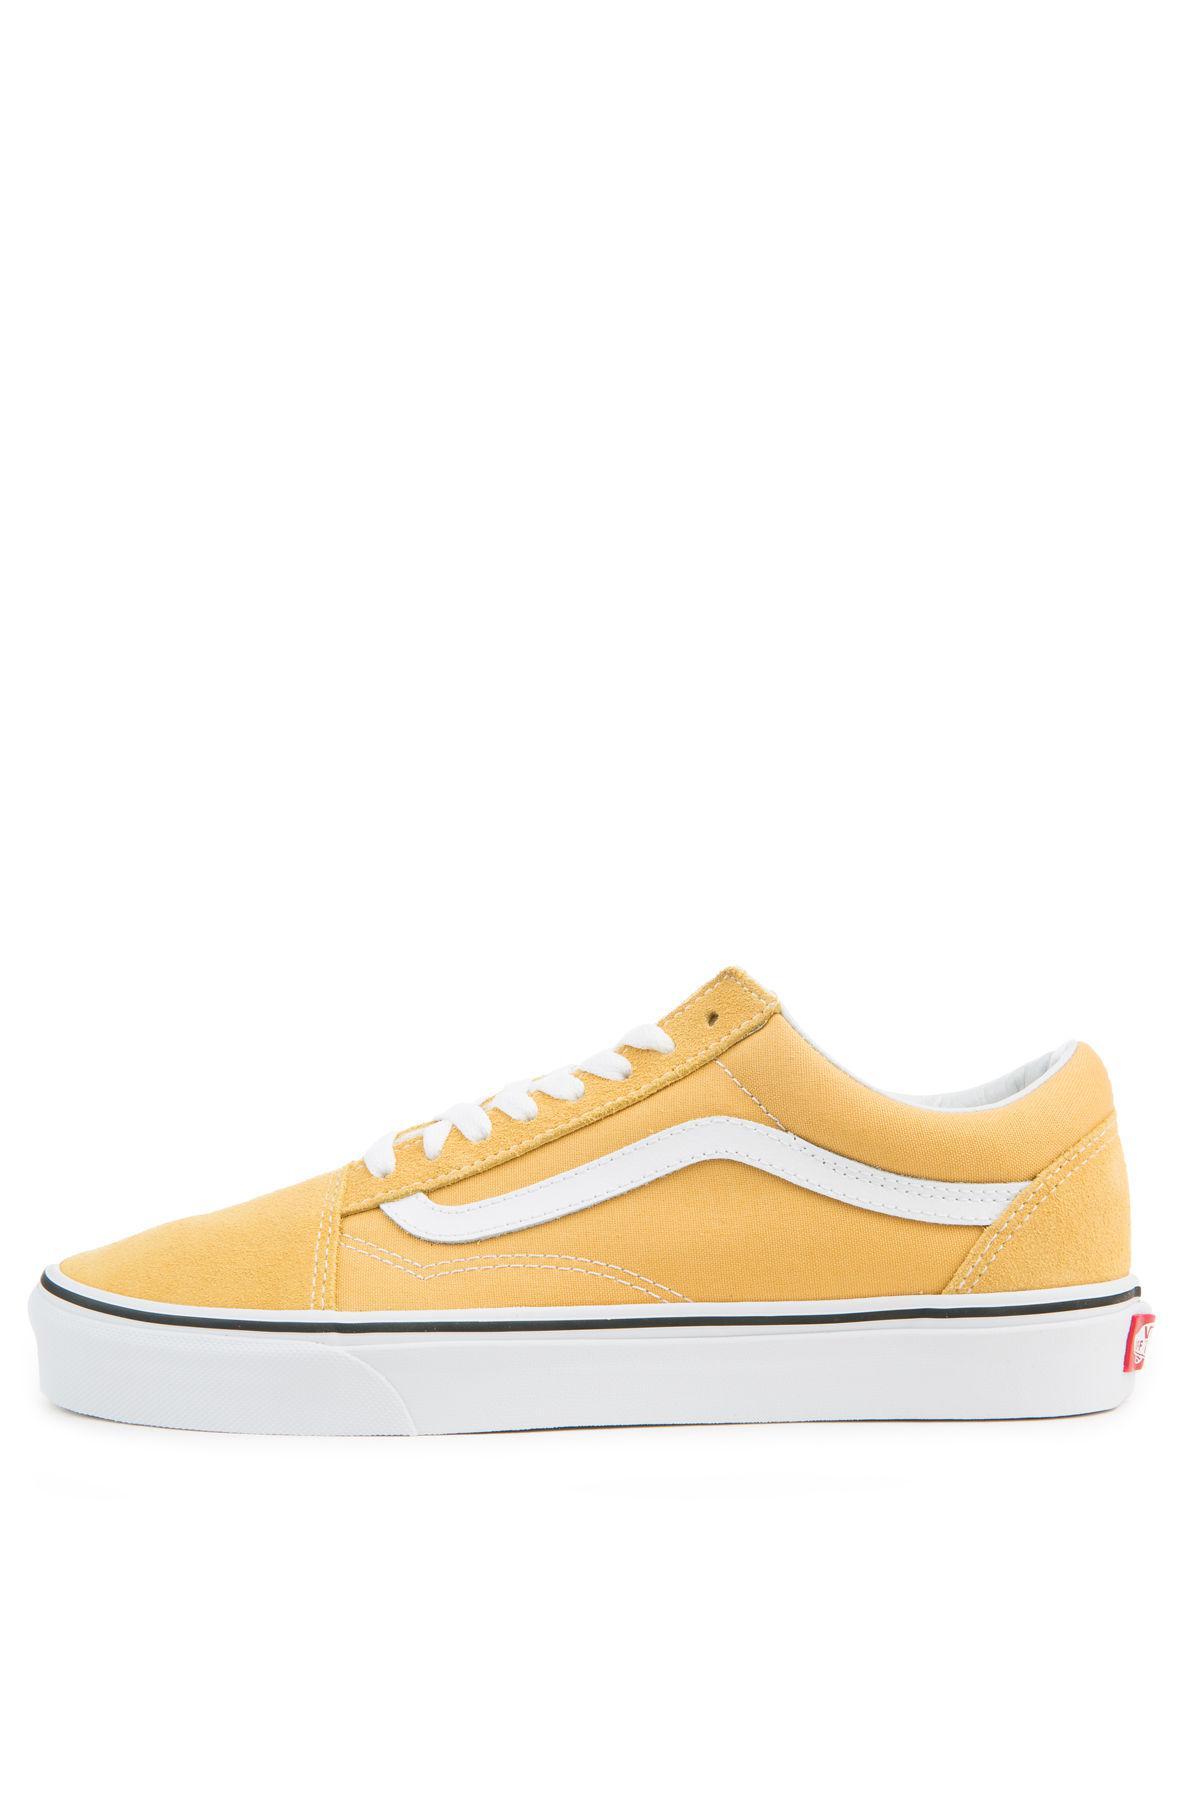 Authentic Sneakers ochre / true whiteVans 37Pr4kYAS